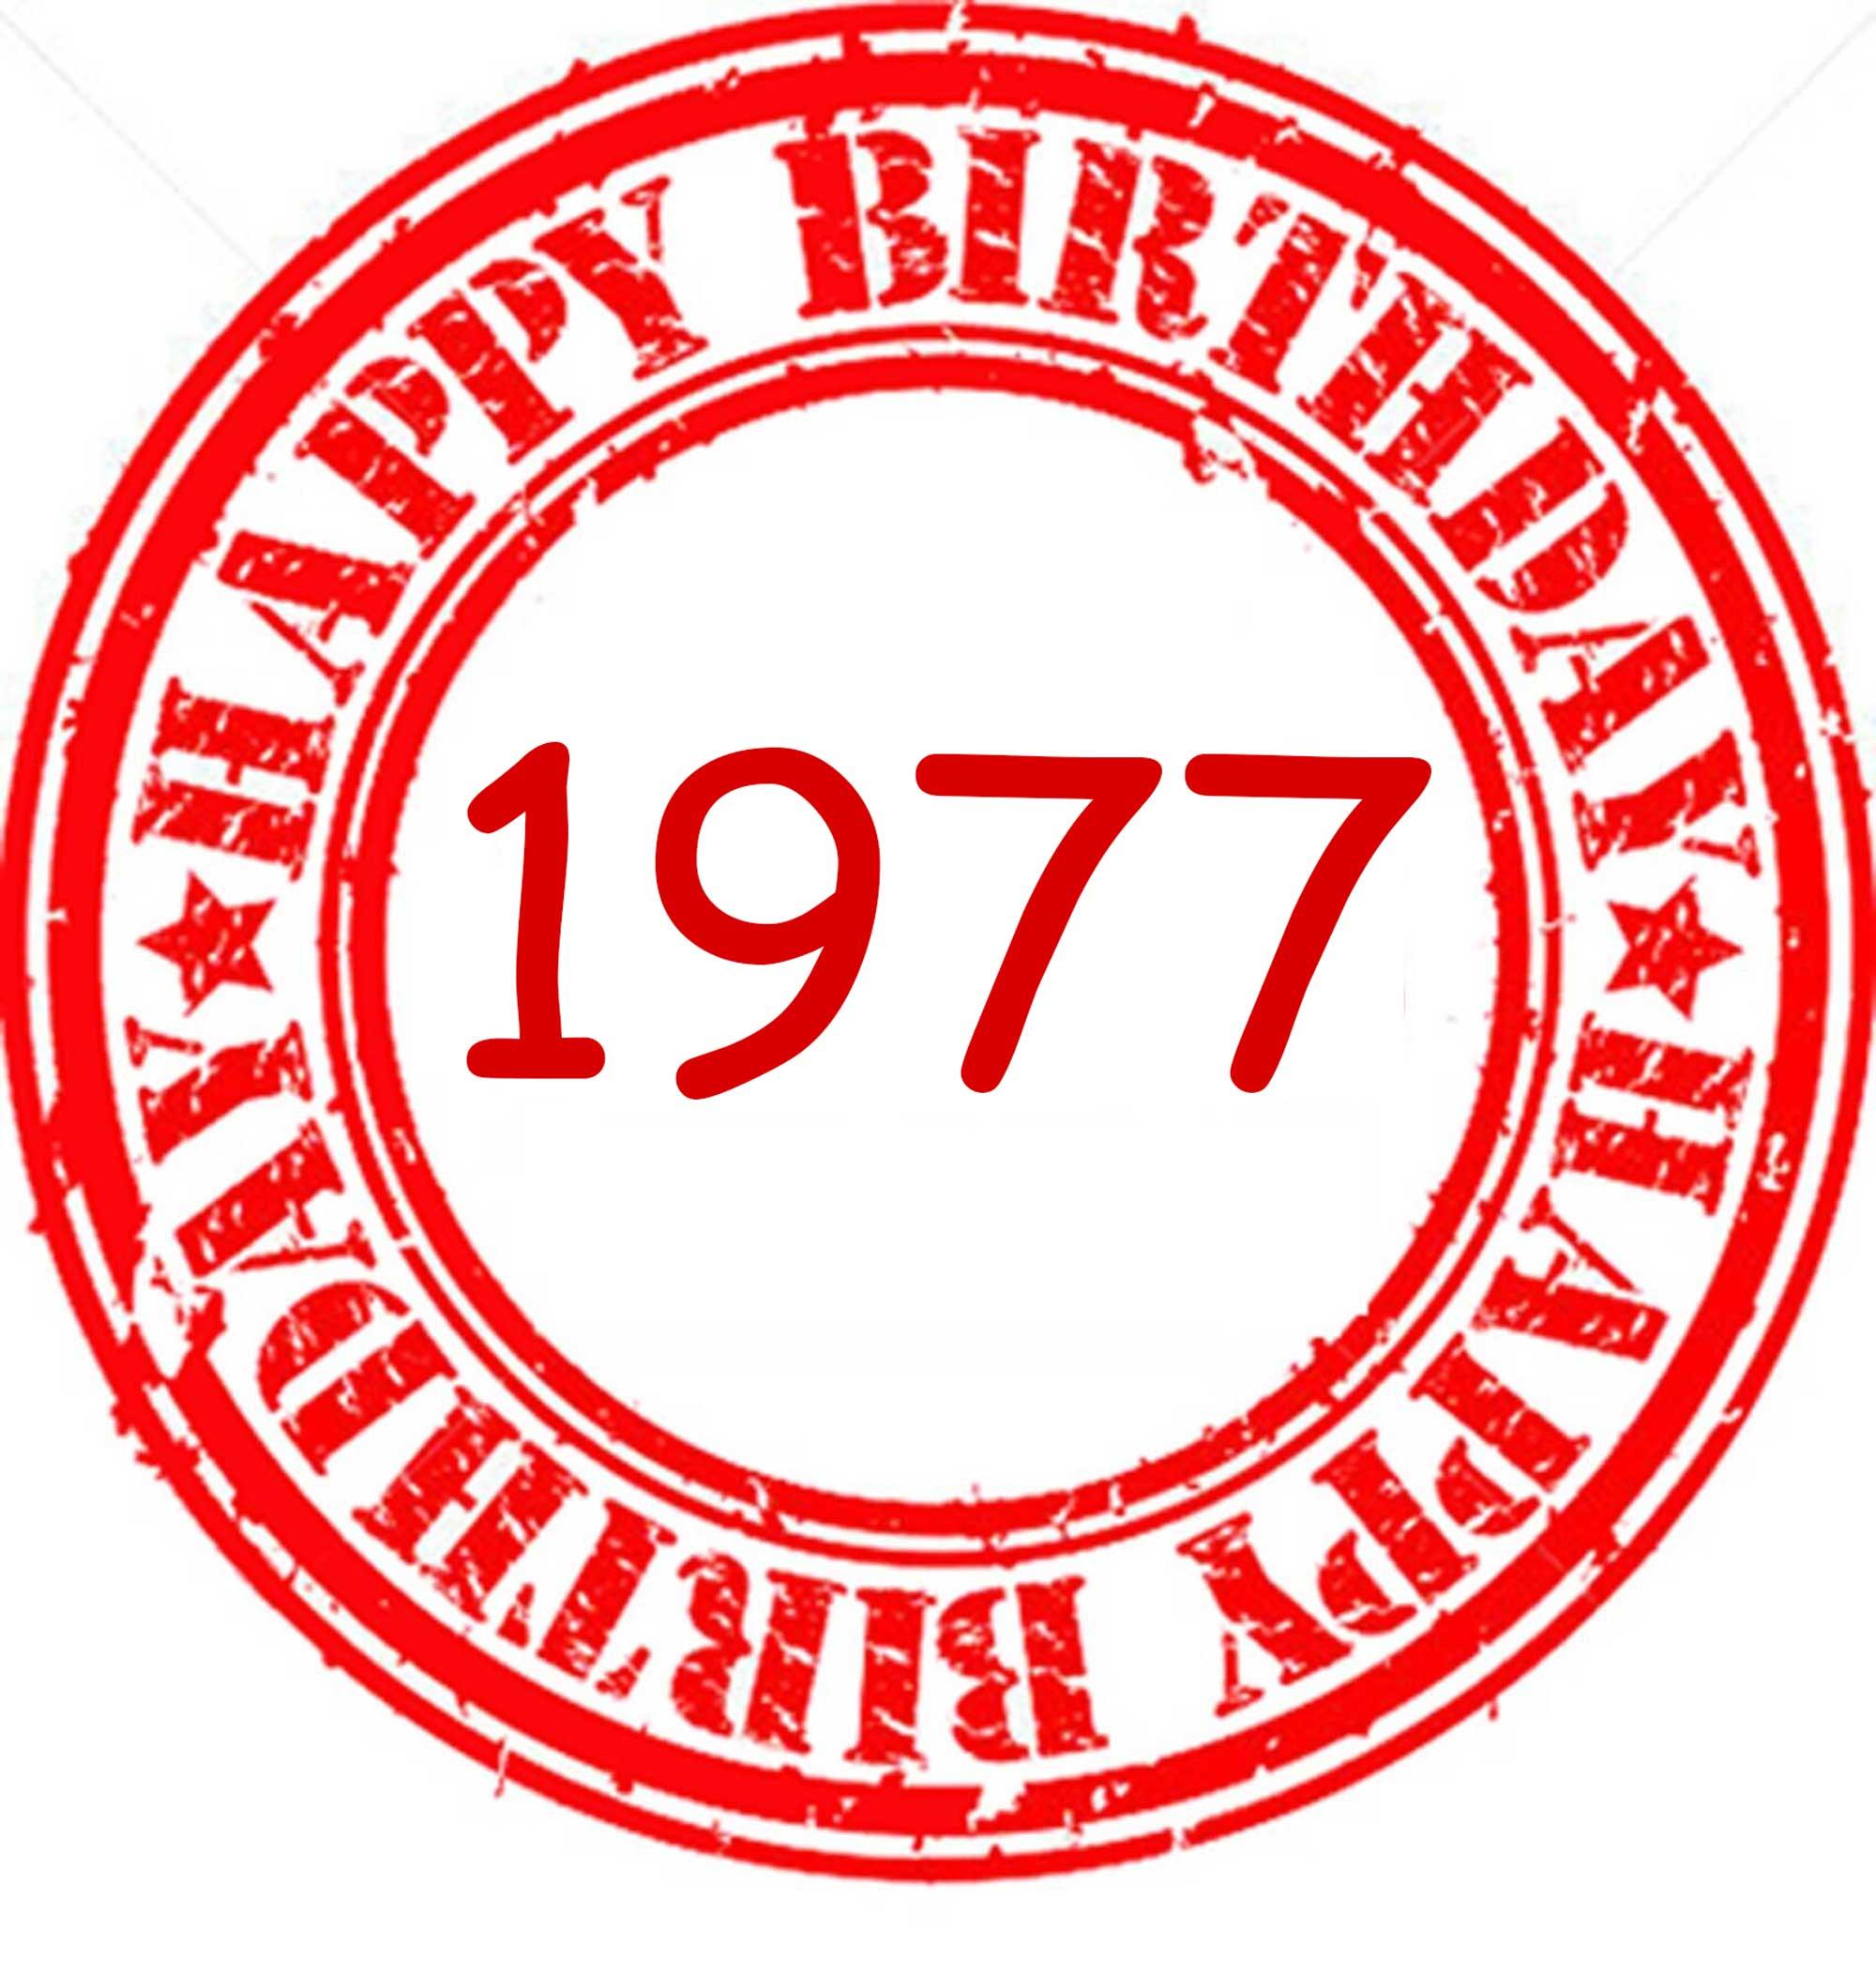 Happy Birthday 1977